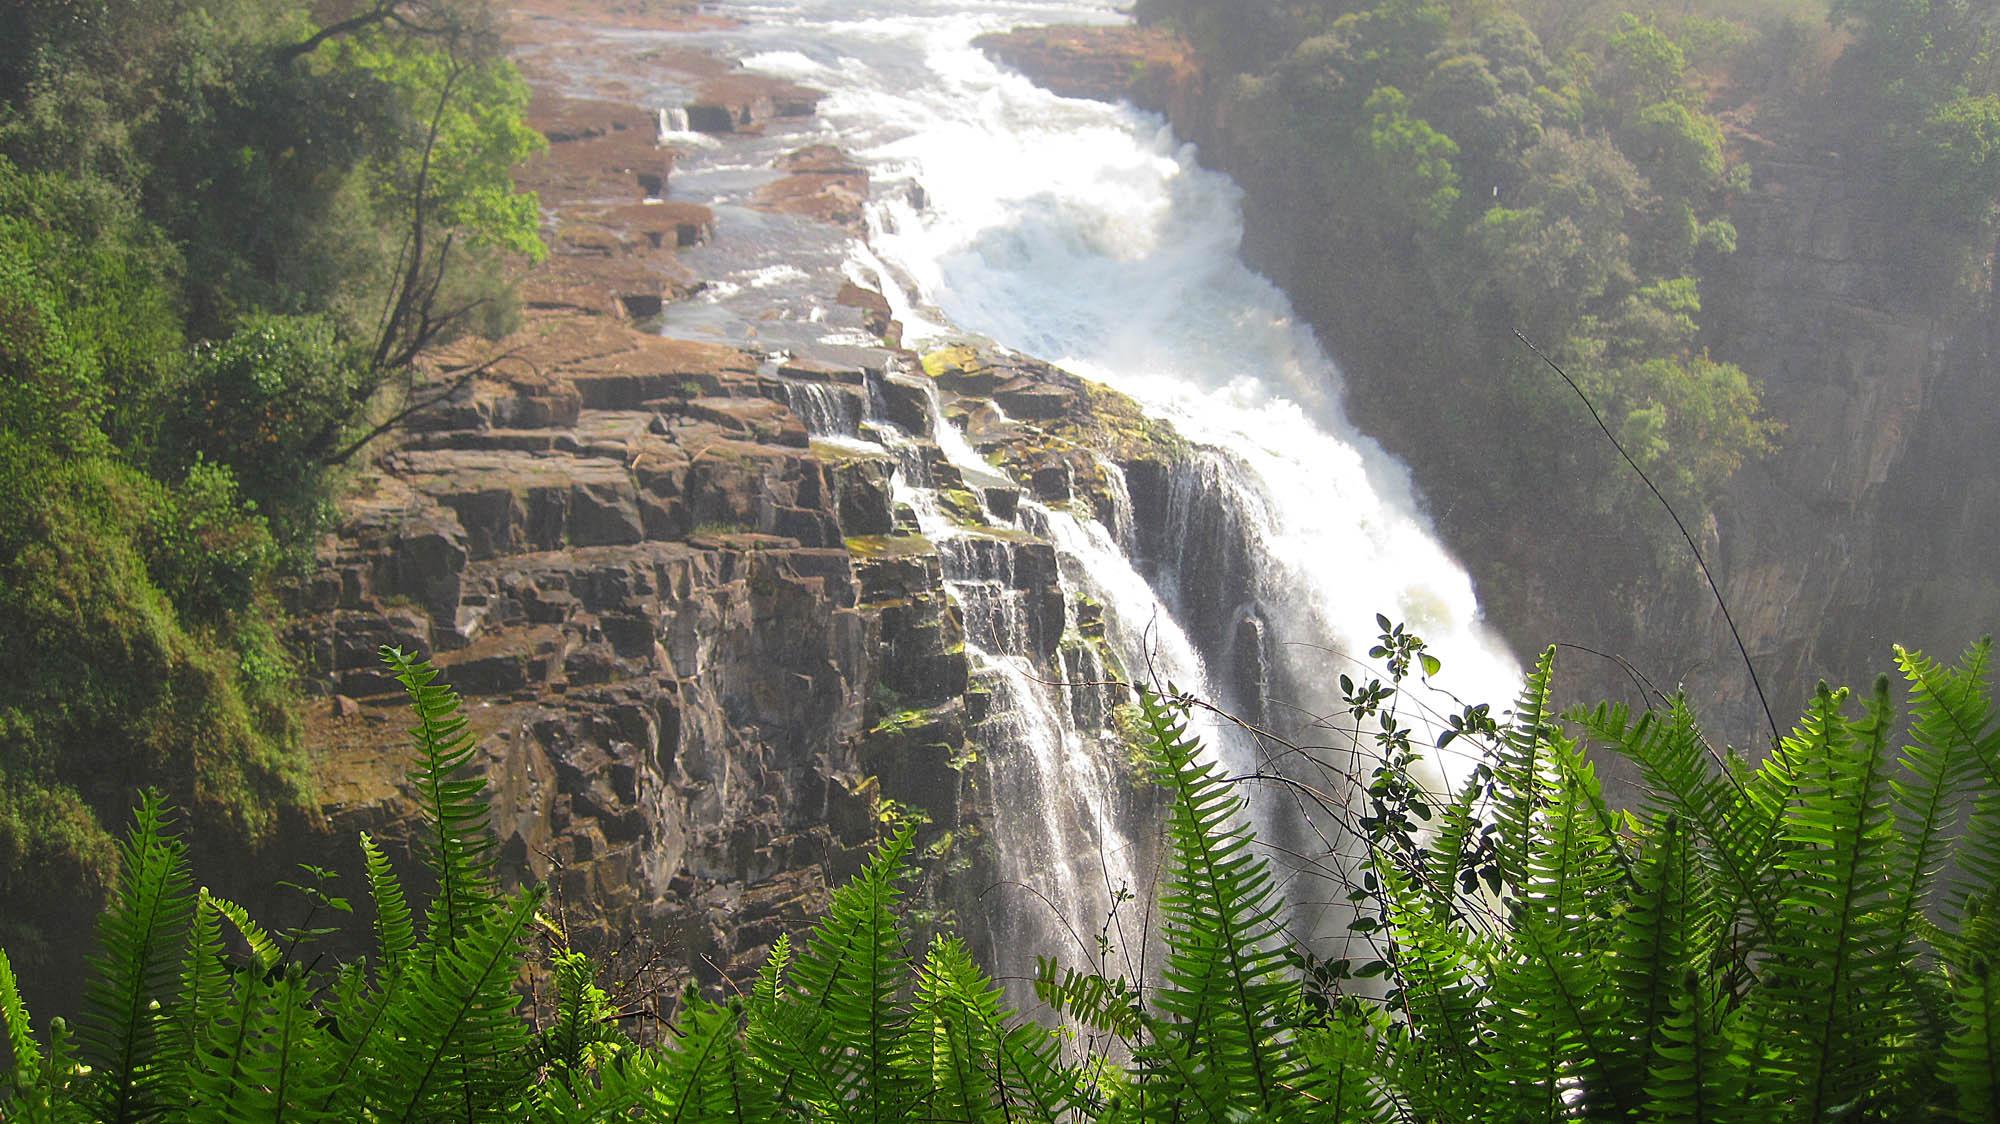 The Cataract Falls